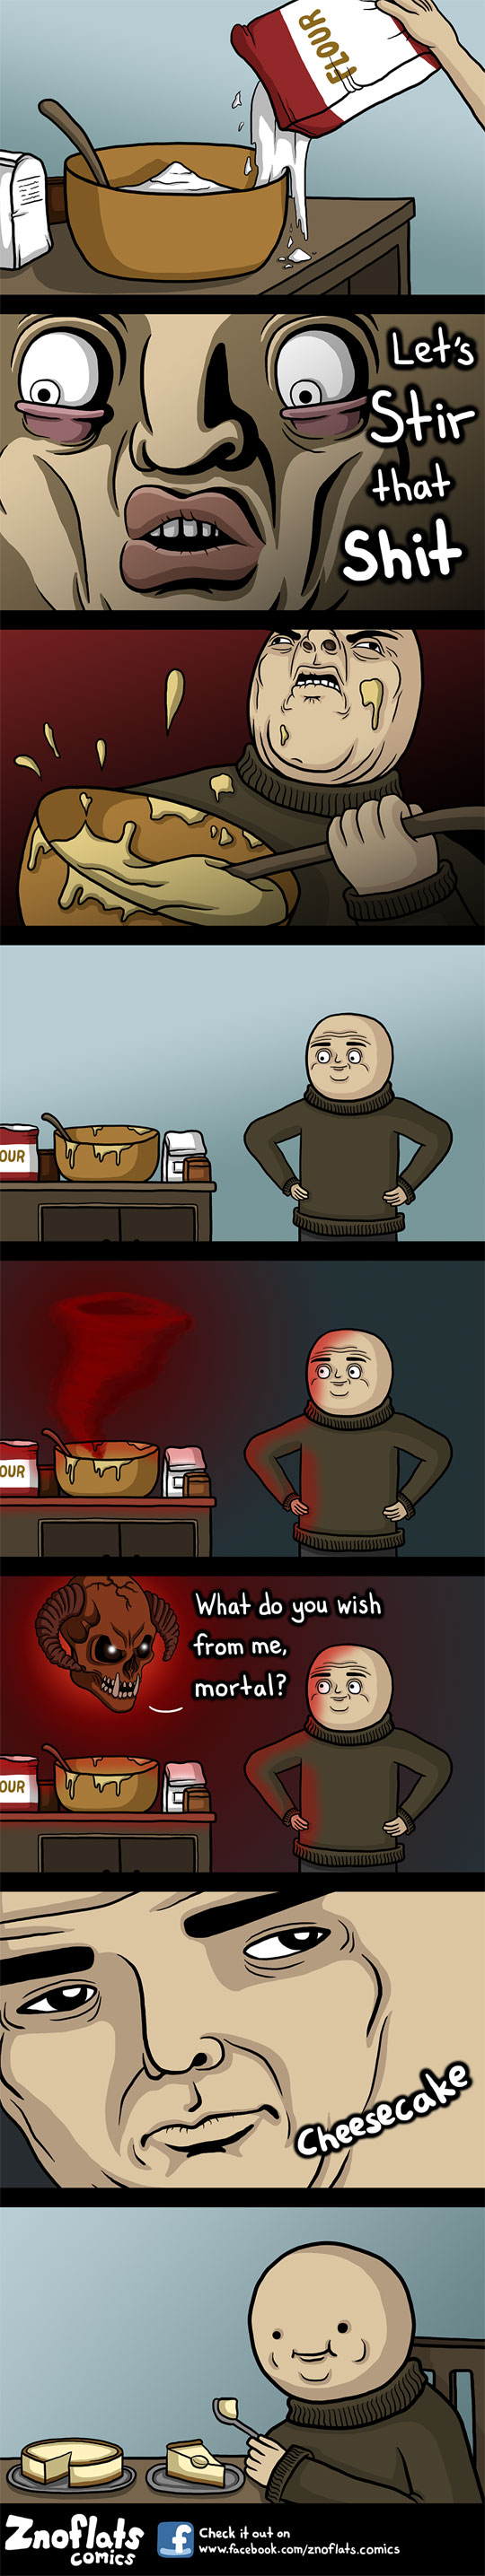 funny-cartoon-baking-stir-Devil